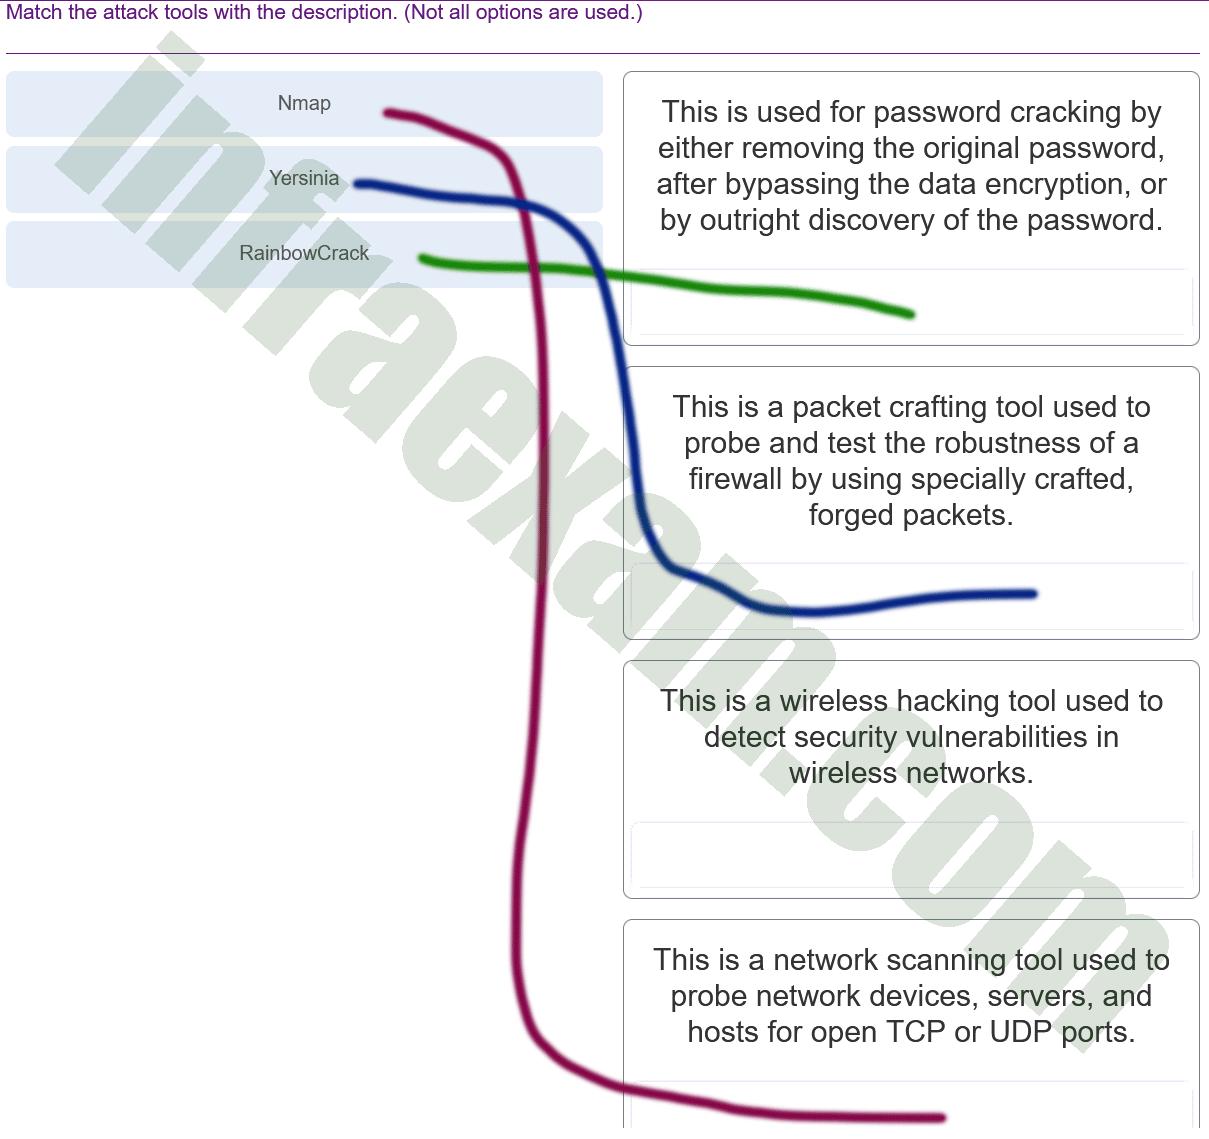 CyberOps Associate (Version 1.0) - CyberOps Associate 1.0 Final exam Answers 005